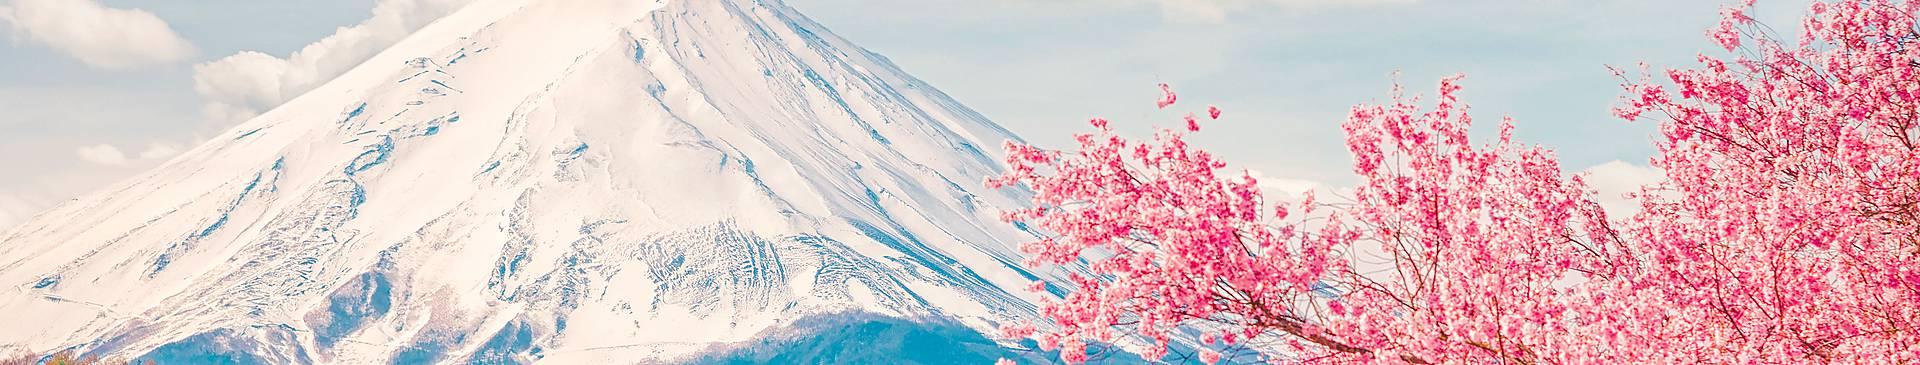 Viaggi in Giappone in primavera